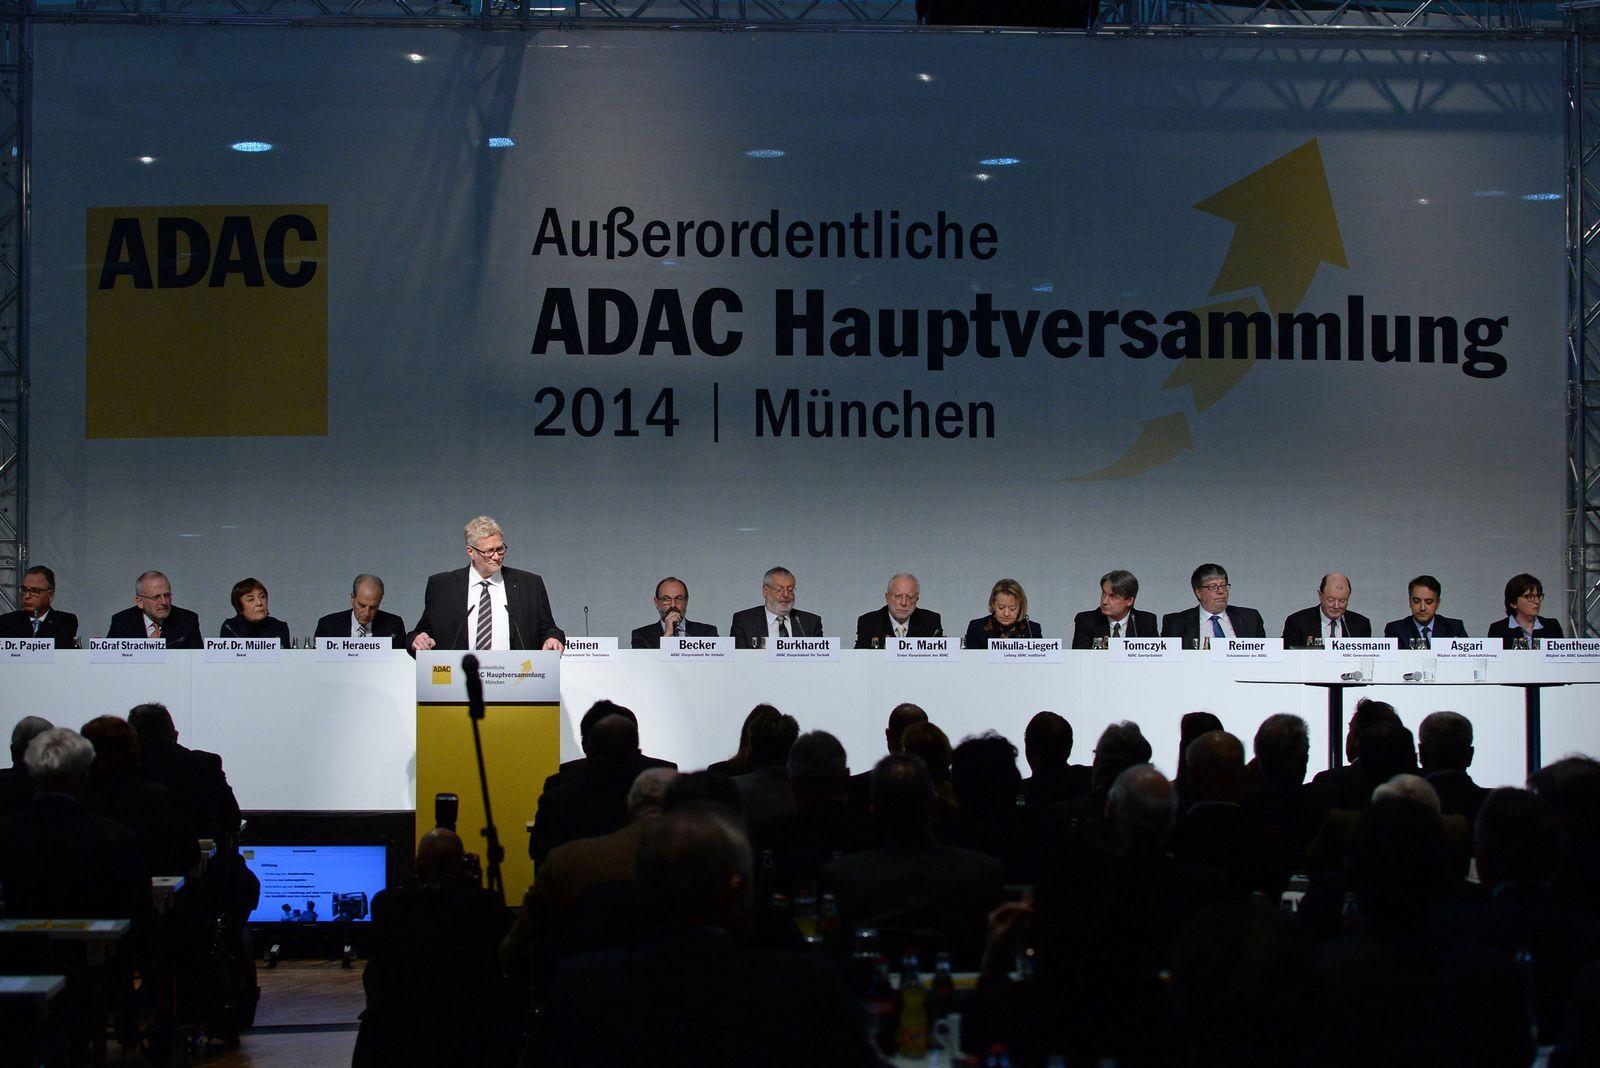 ADAC-Hauptversammlung